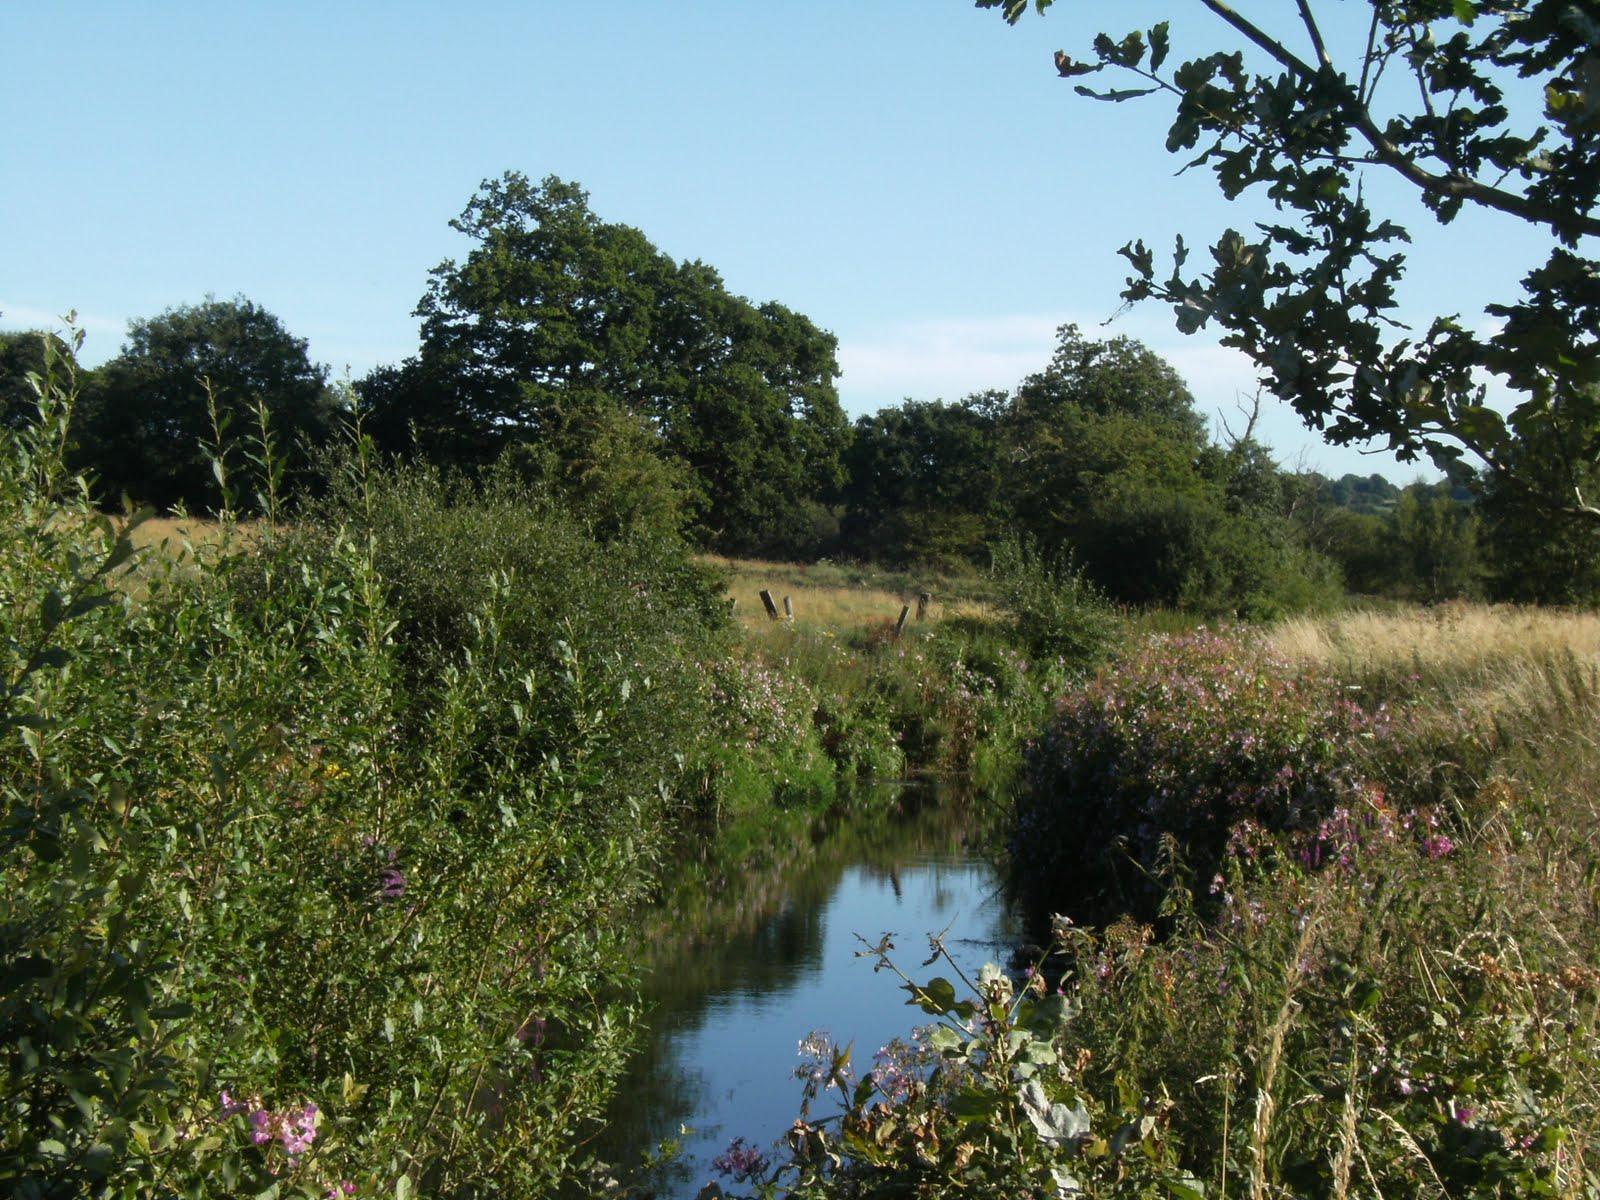 DSCF9323 River Medway near Ashurst